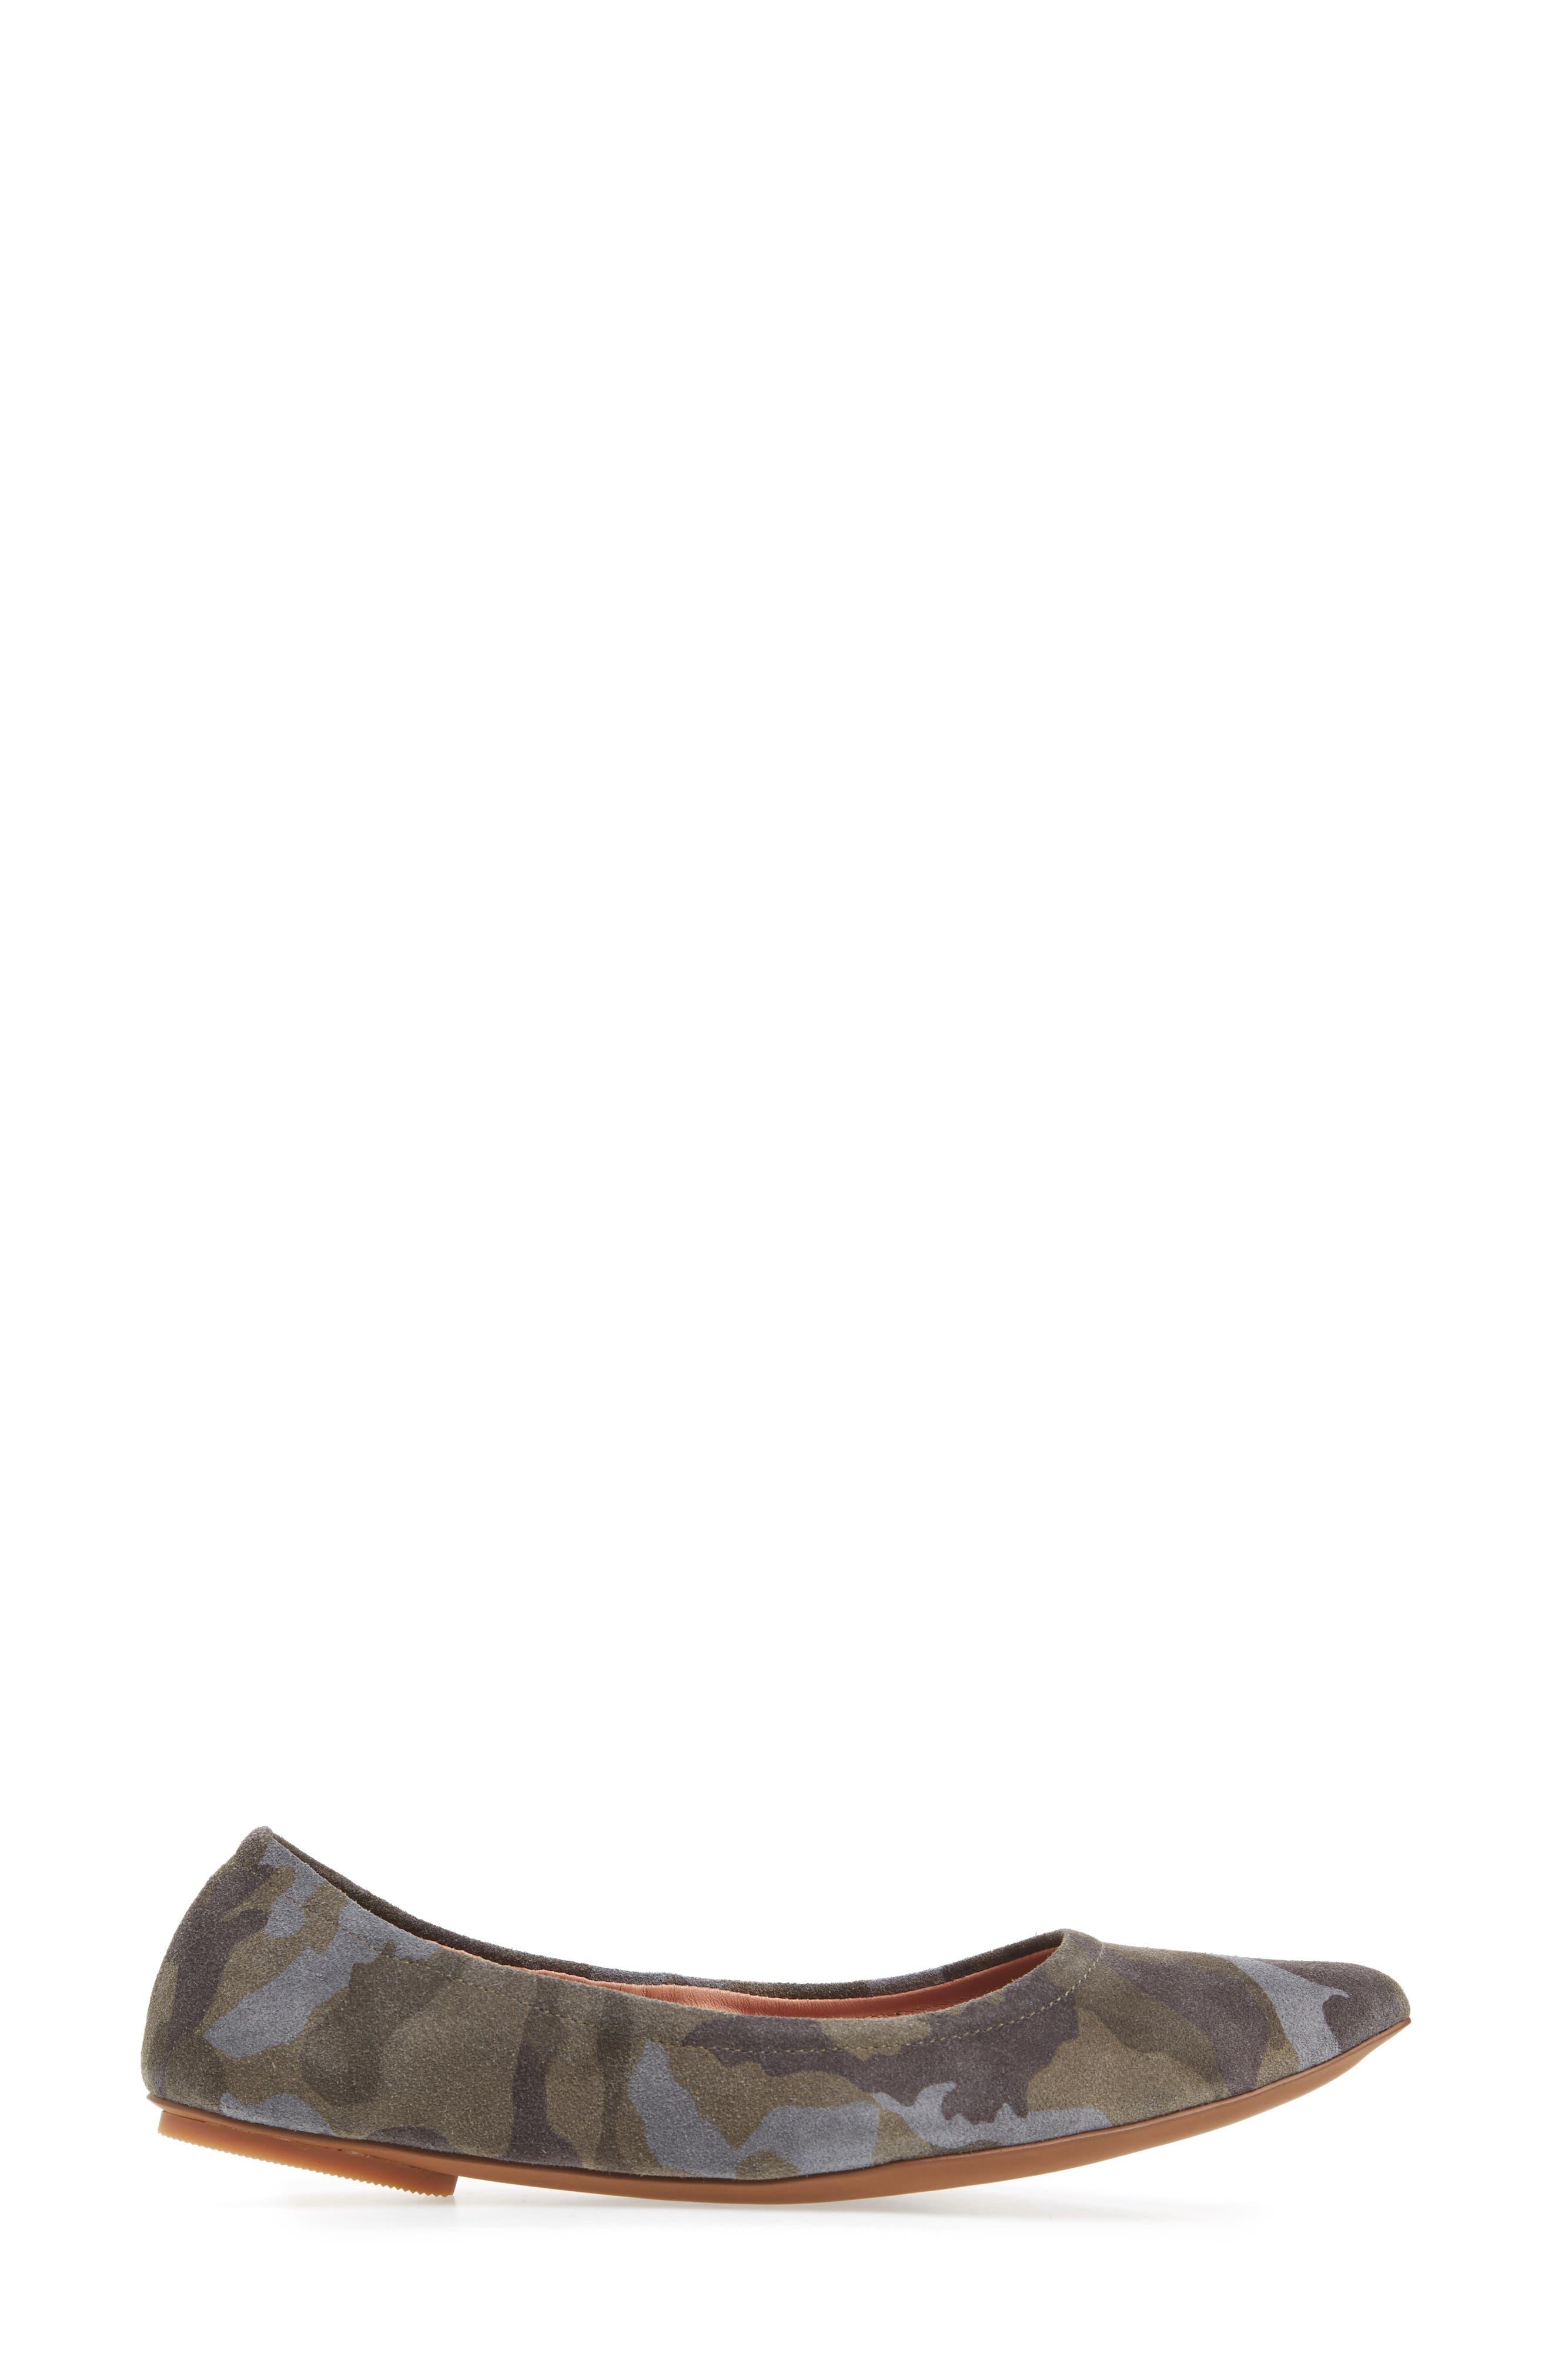 Alternate Image 3  - Linea Paolo Nico Pointy Toe Flat (Women)